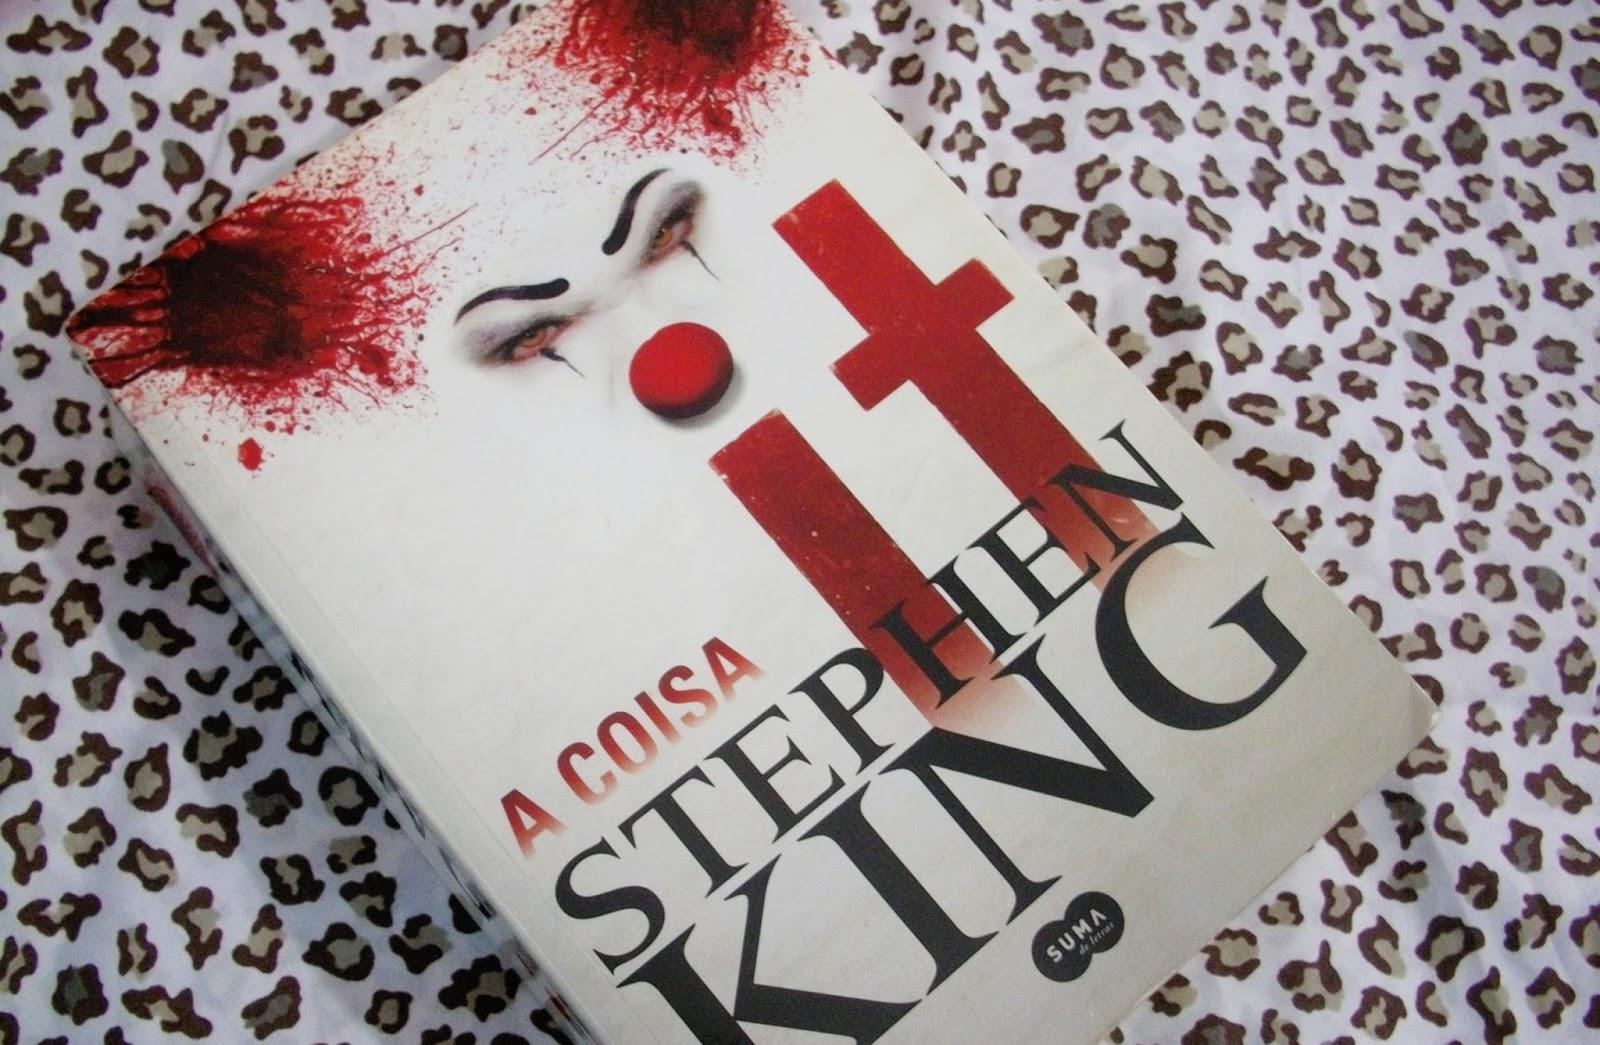 IT - A Coisa, de Stephen King (#8)